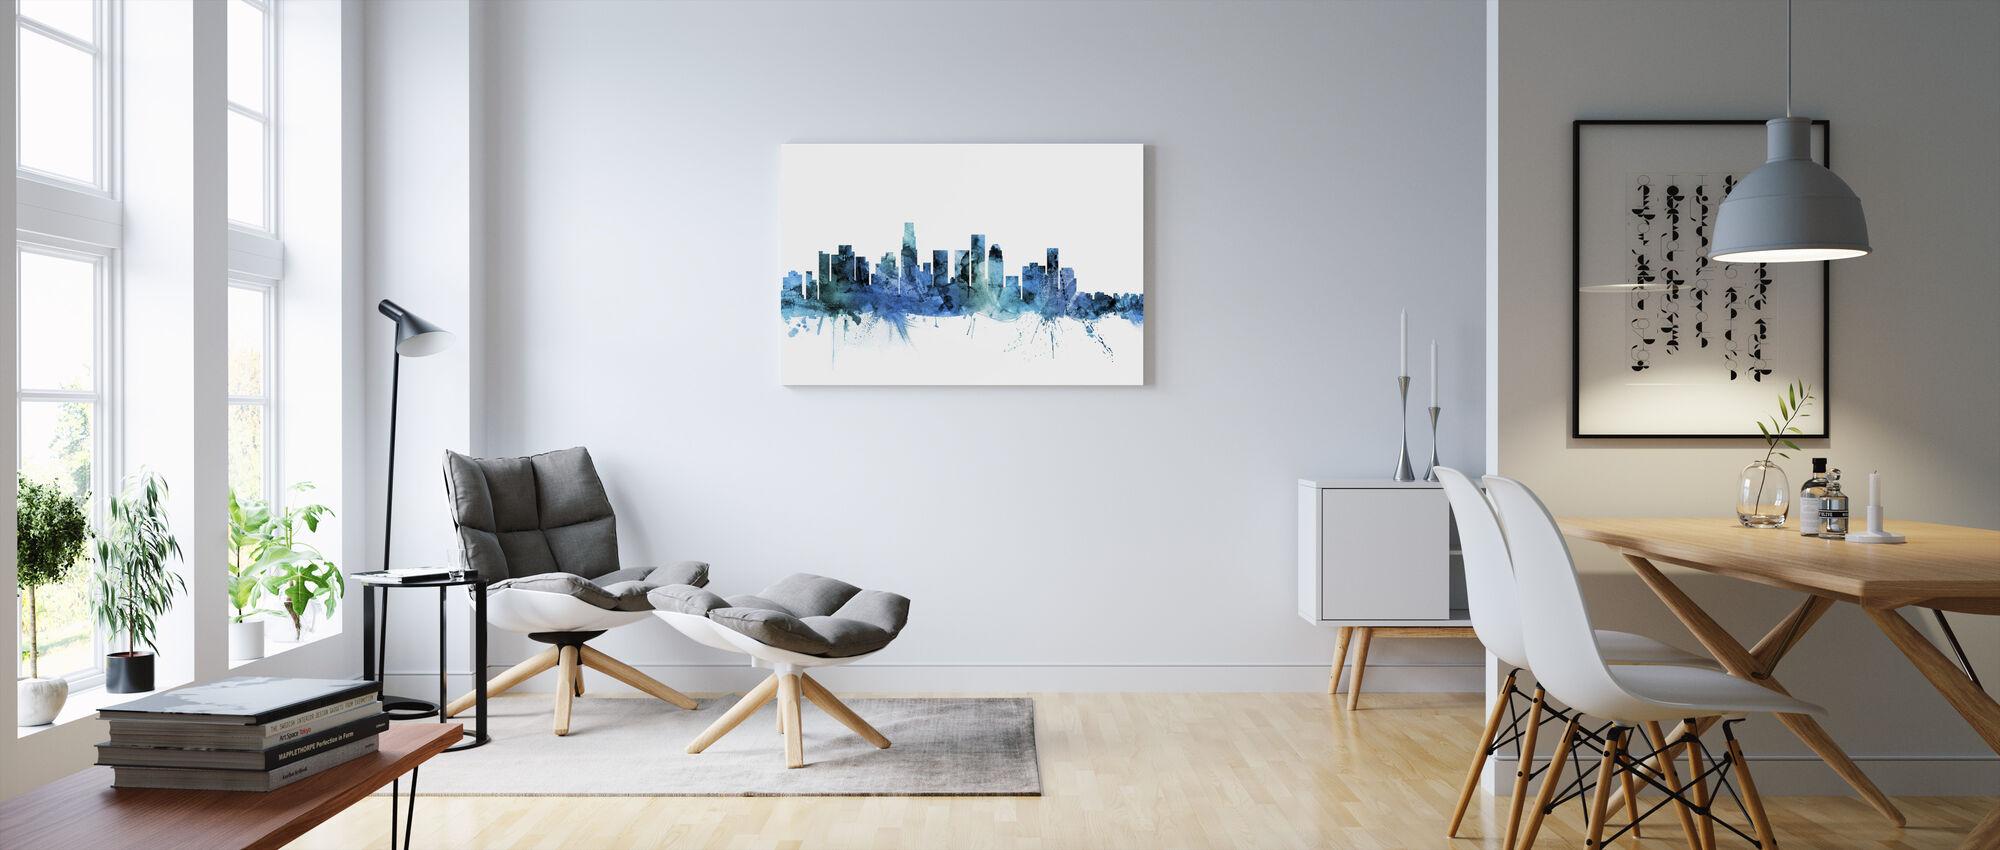 Los Angeles California Skyline - Canvas print - Living Room